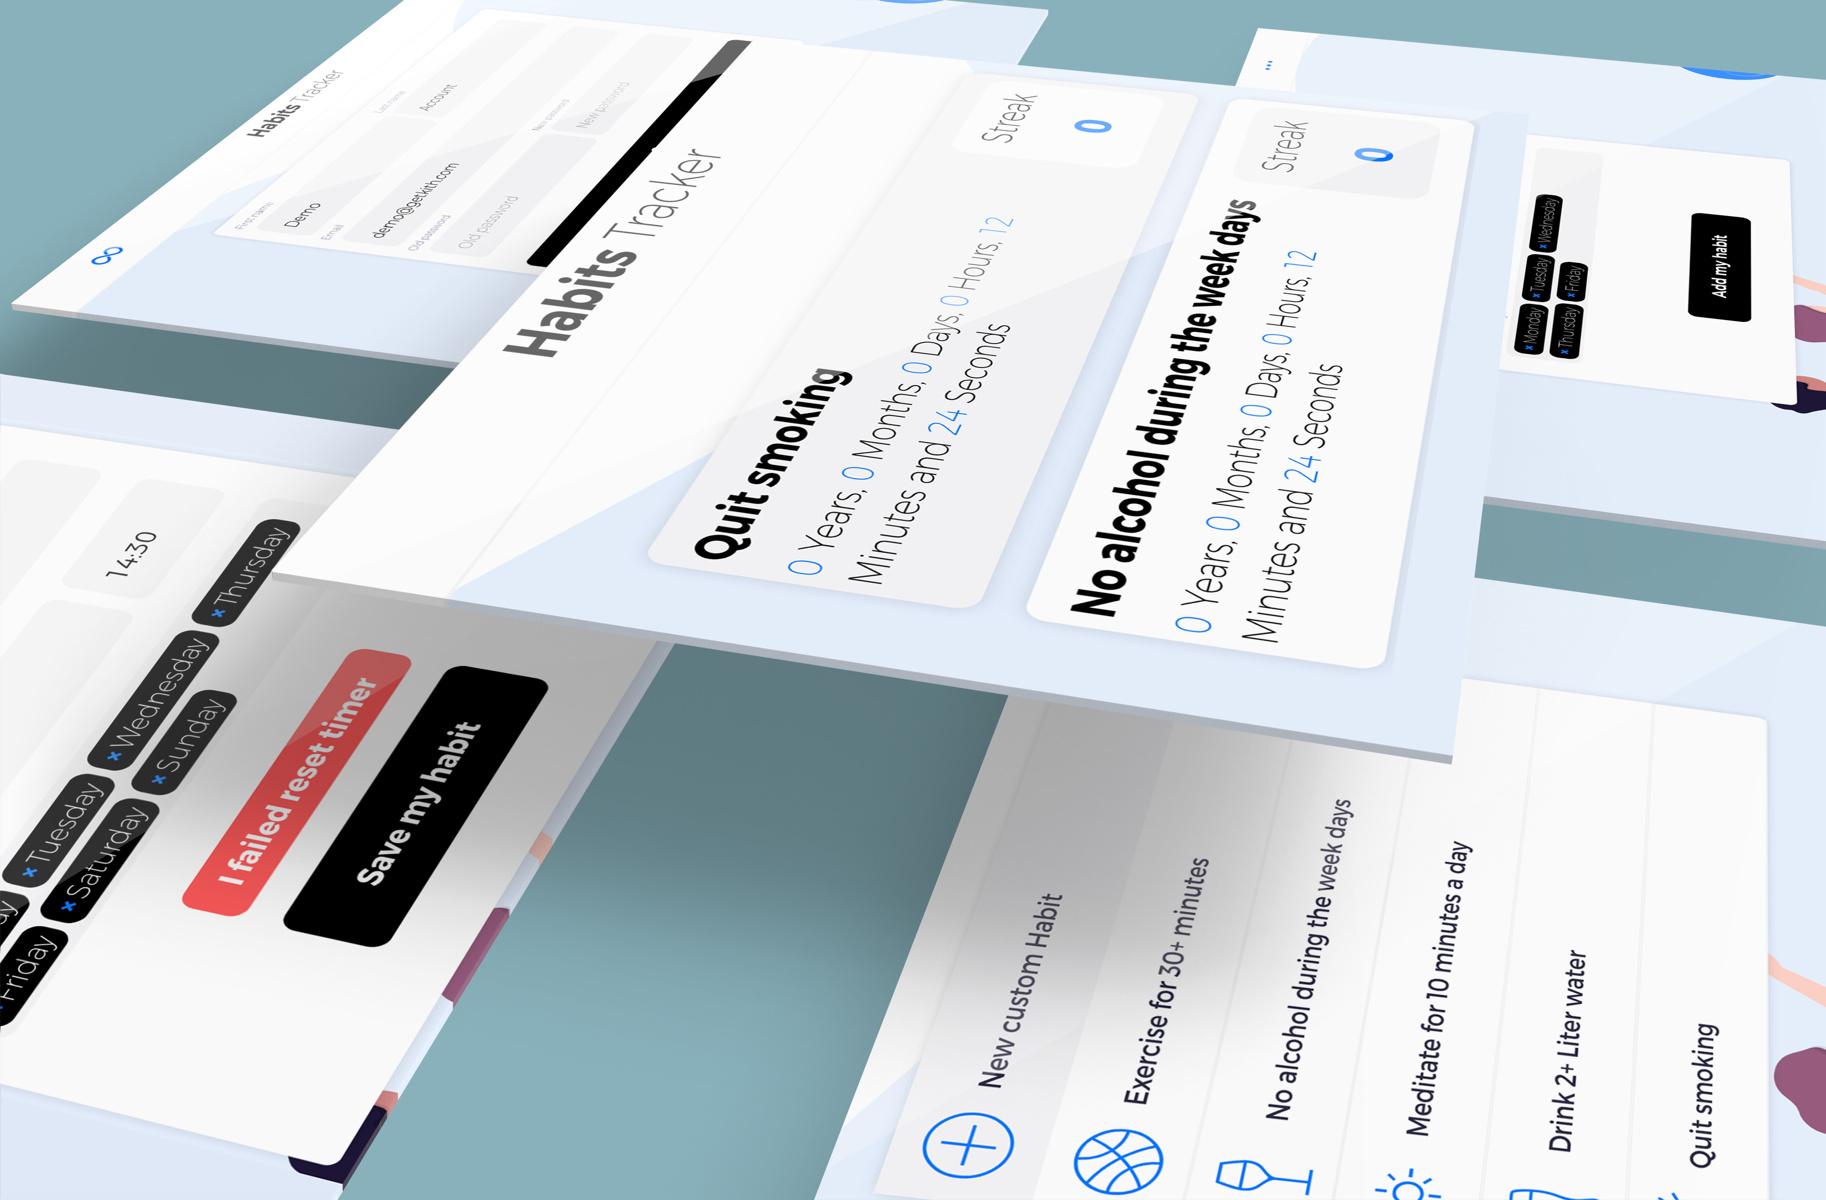 New template] SaaS Habit Tracker Template ♾ - Showcase